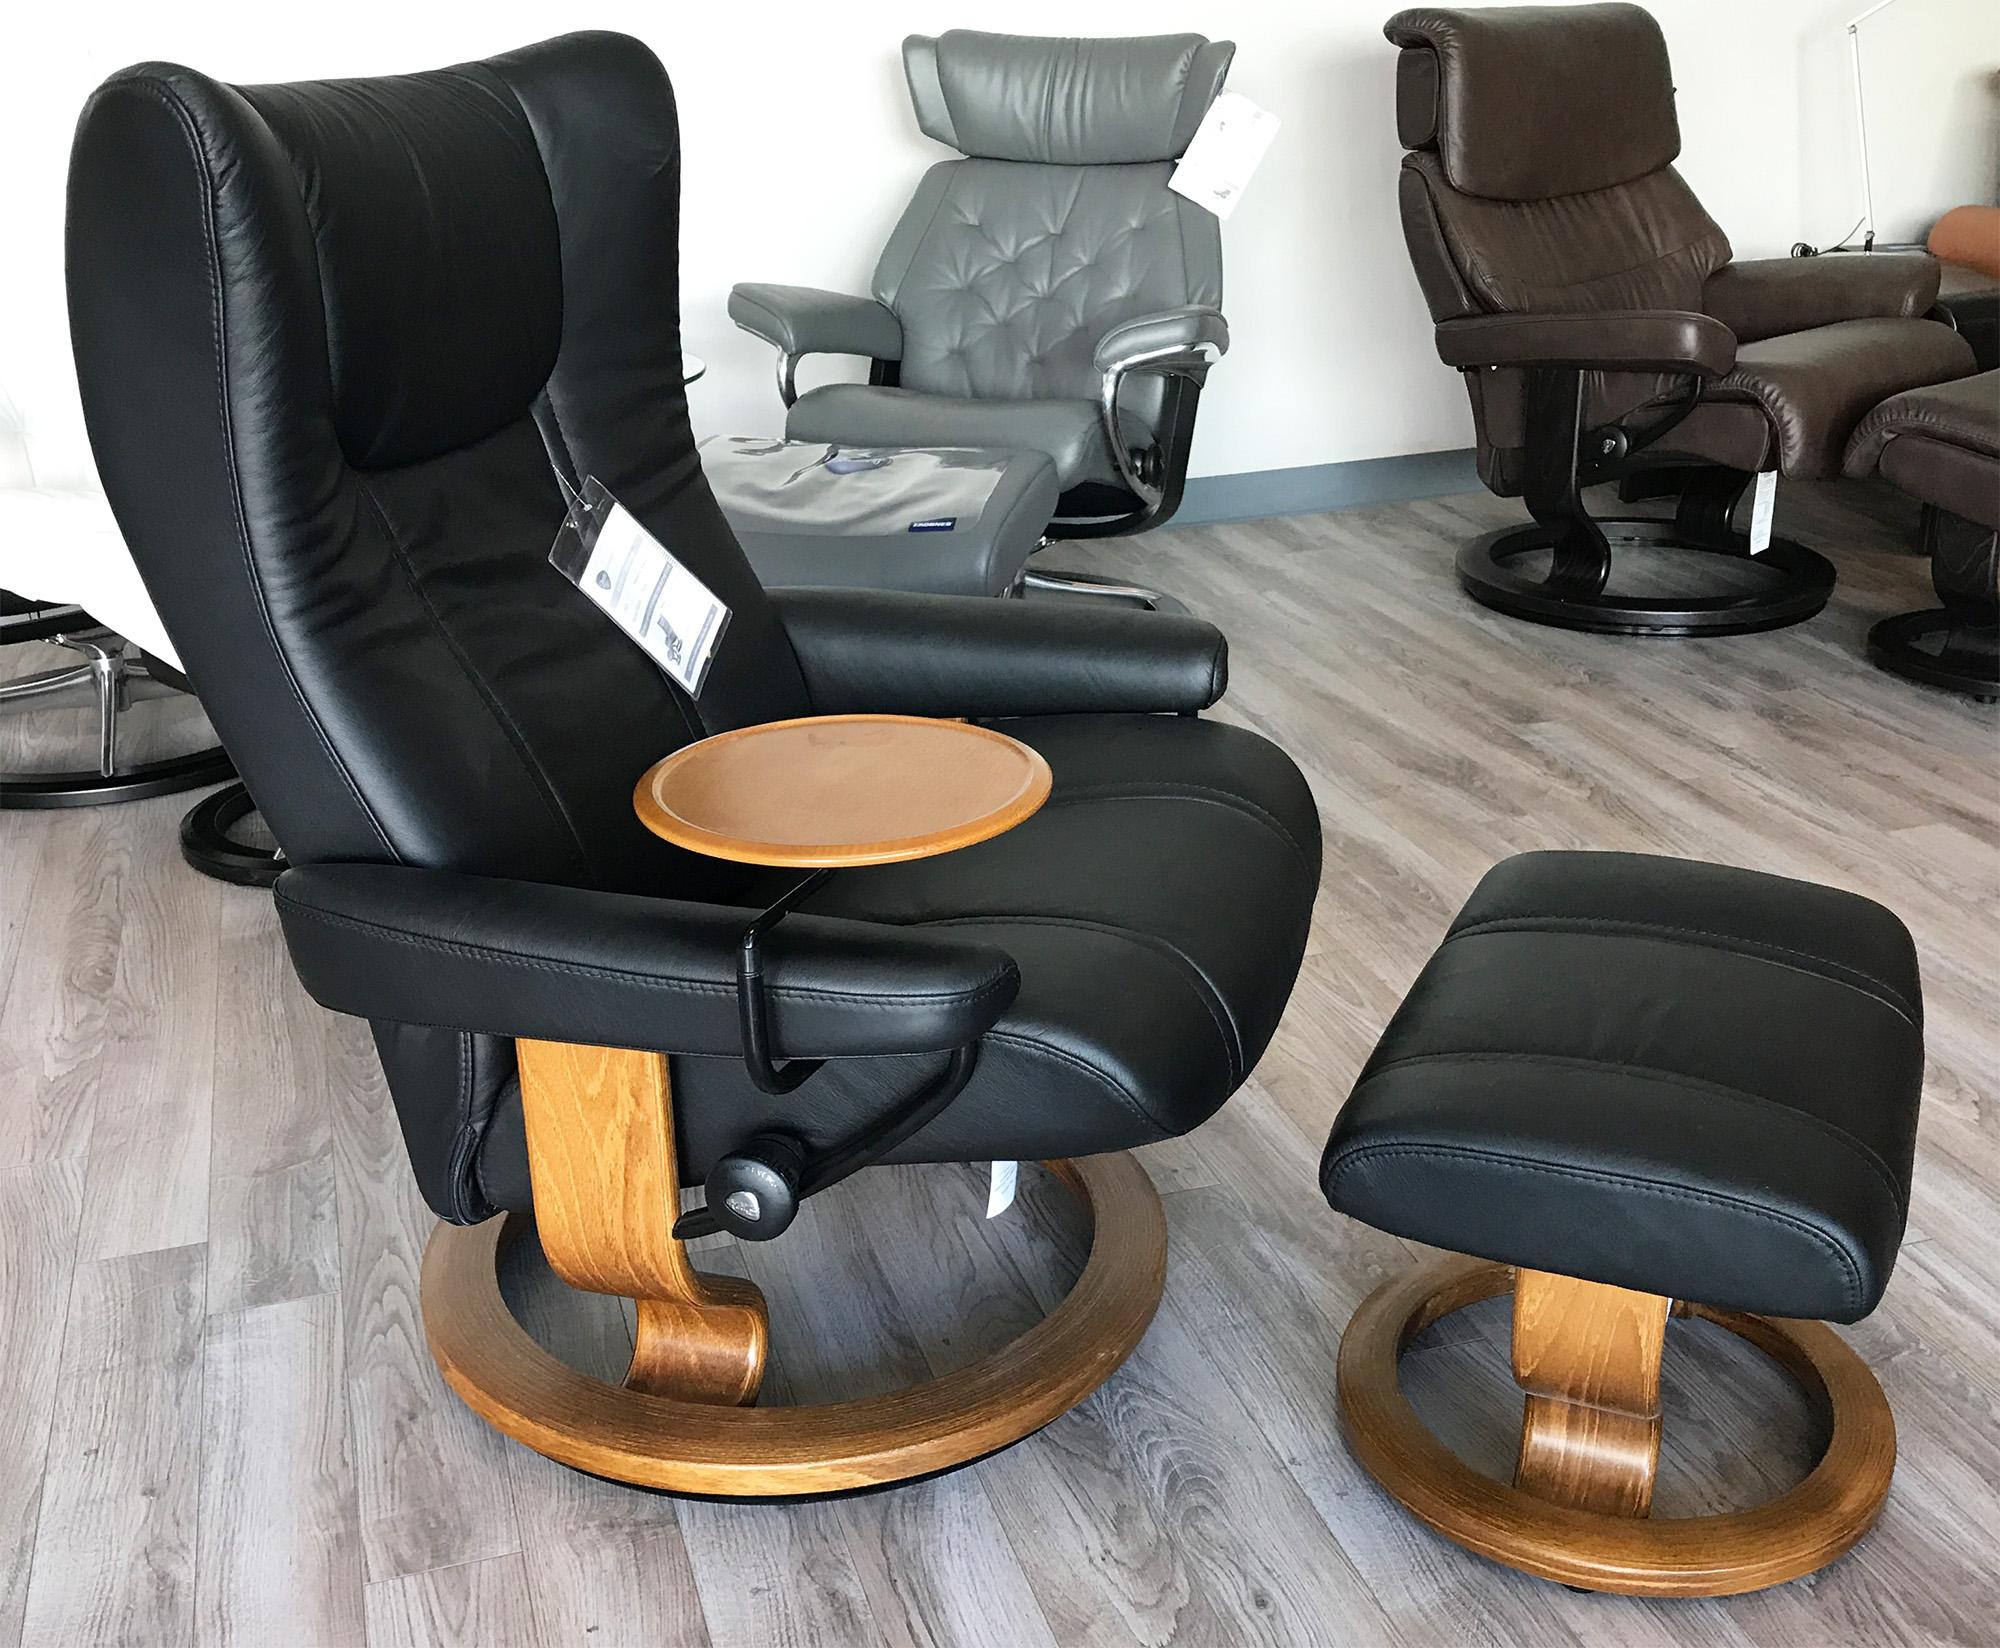 Medium Wing Stressless Cori Amarone Leather Recliner Chair By Ekornes